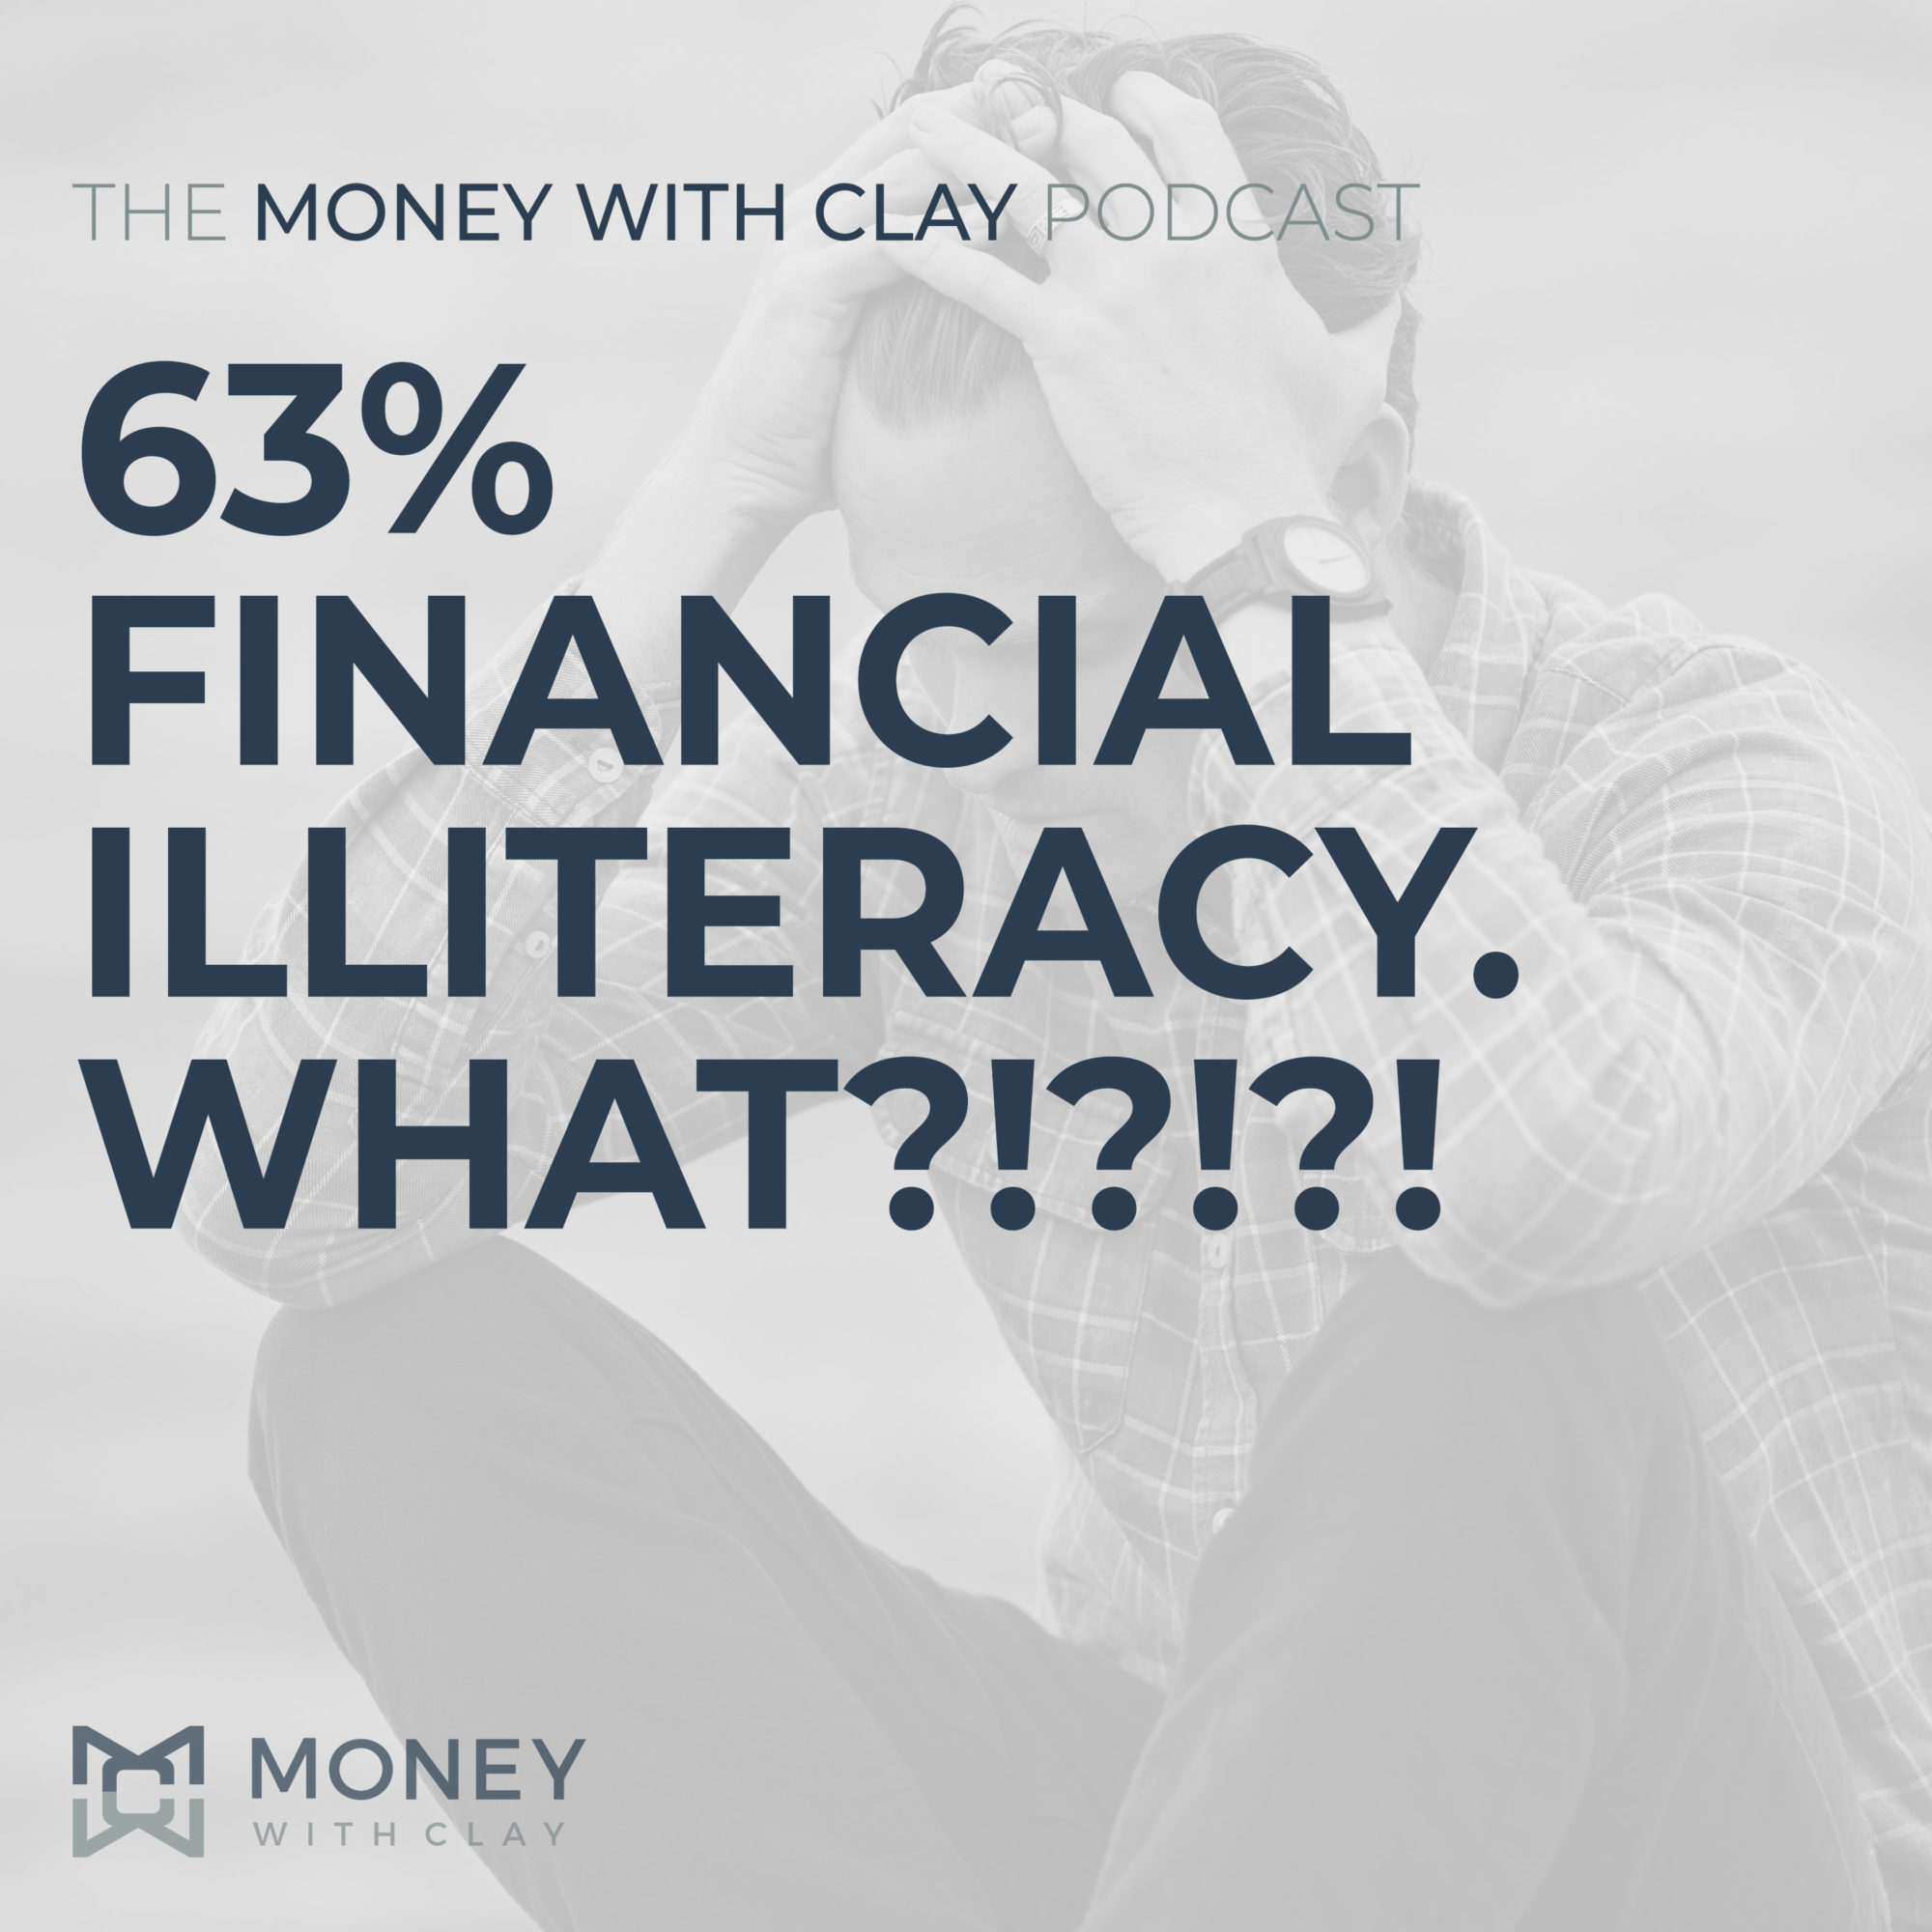 #092 - 63% Financial Illiteracy. What?!?!?!